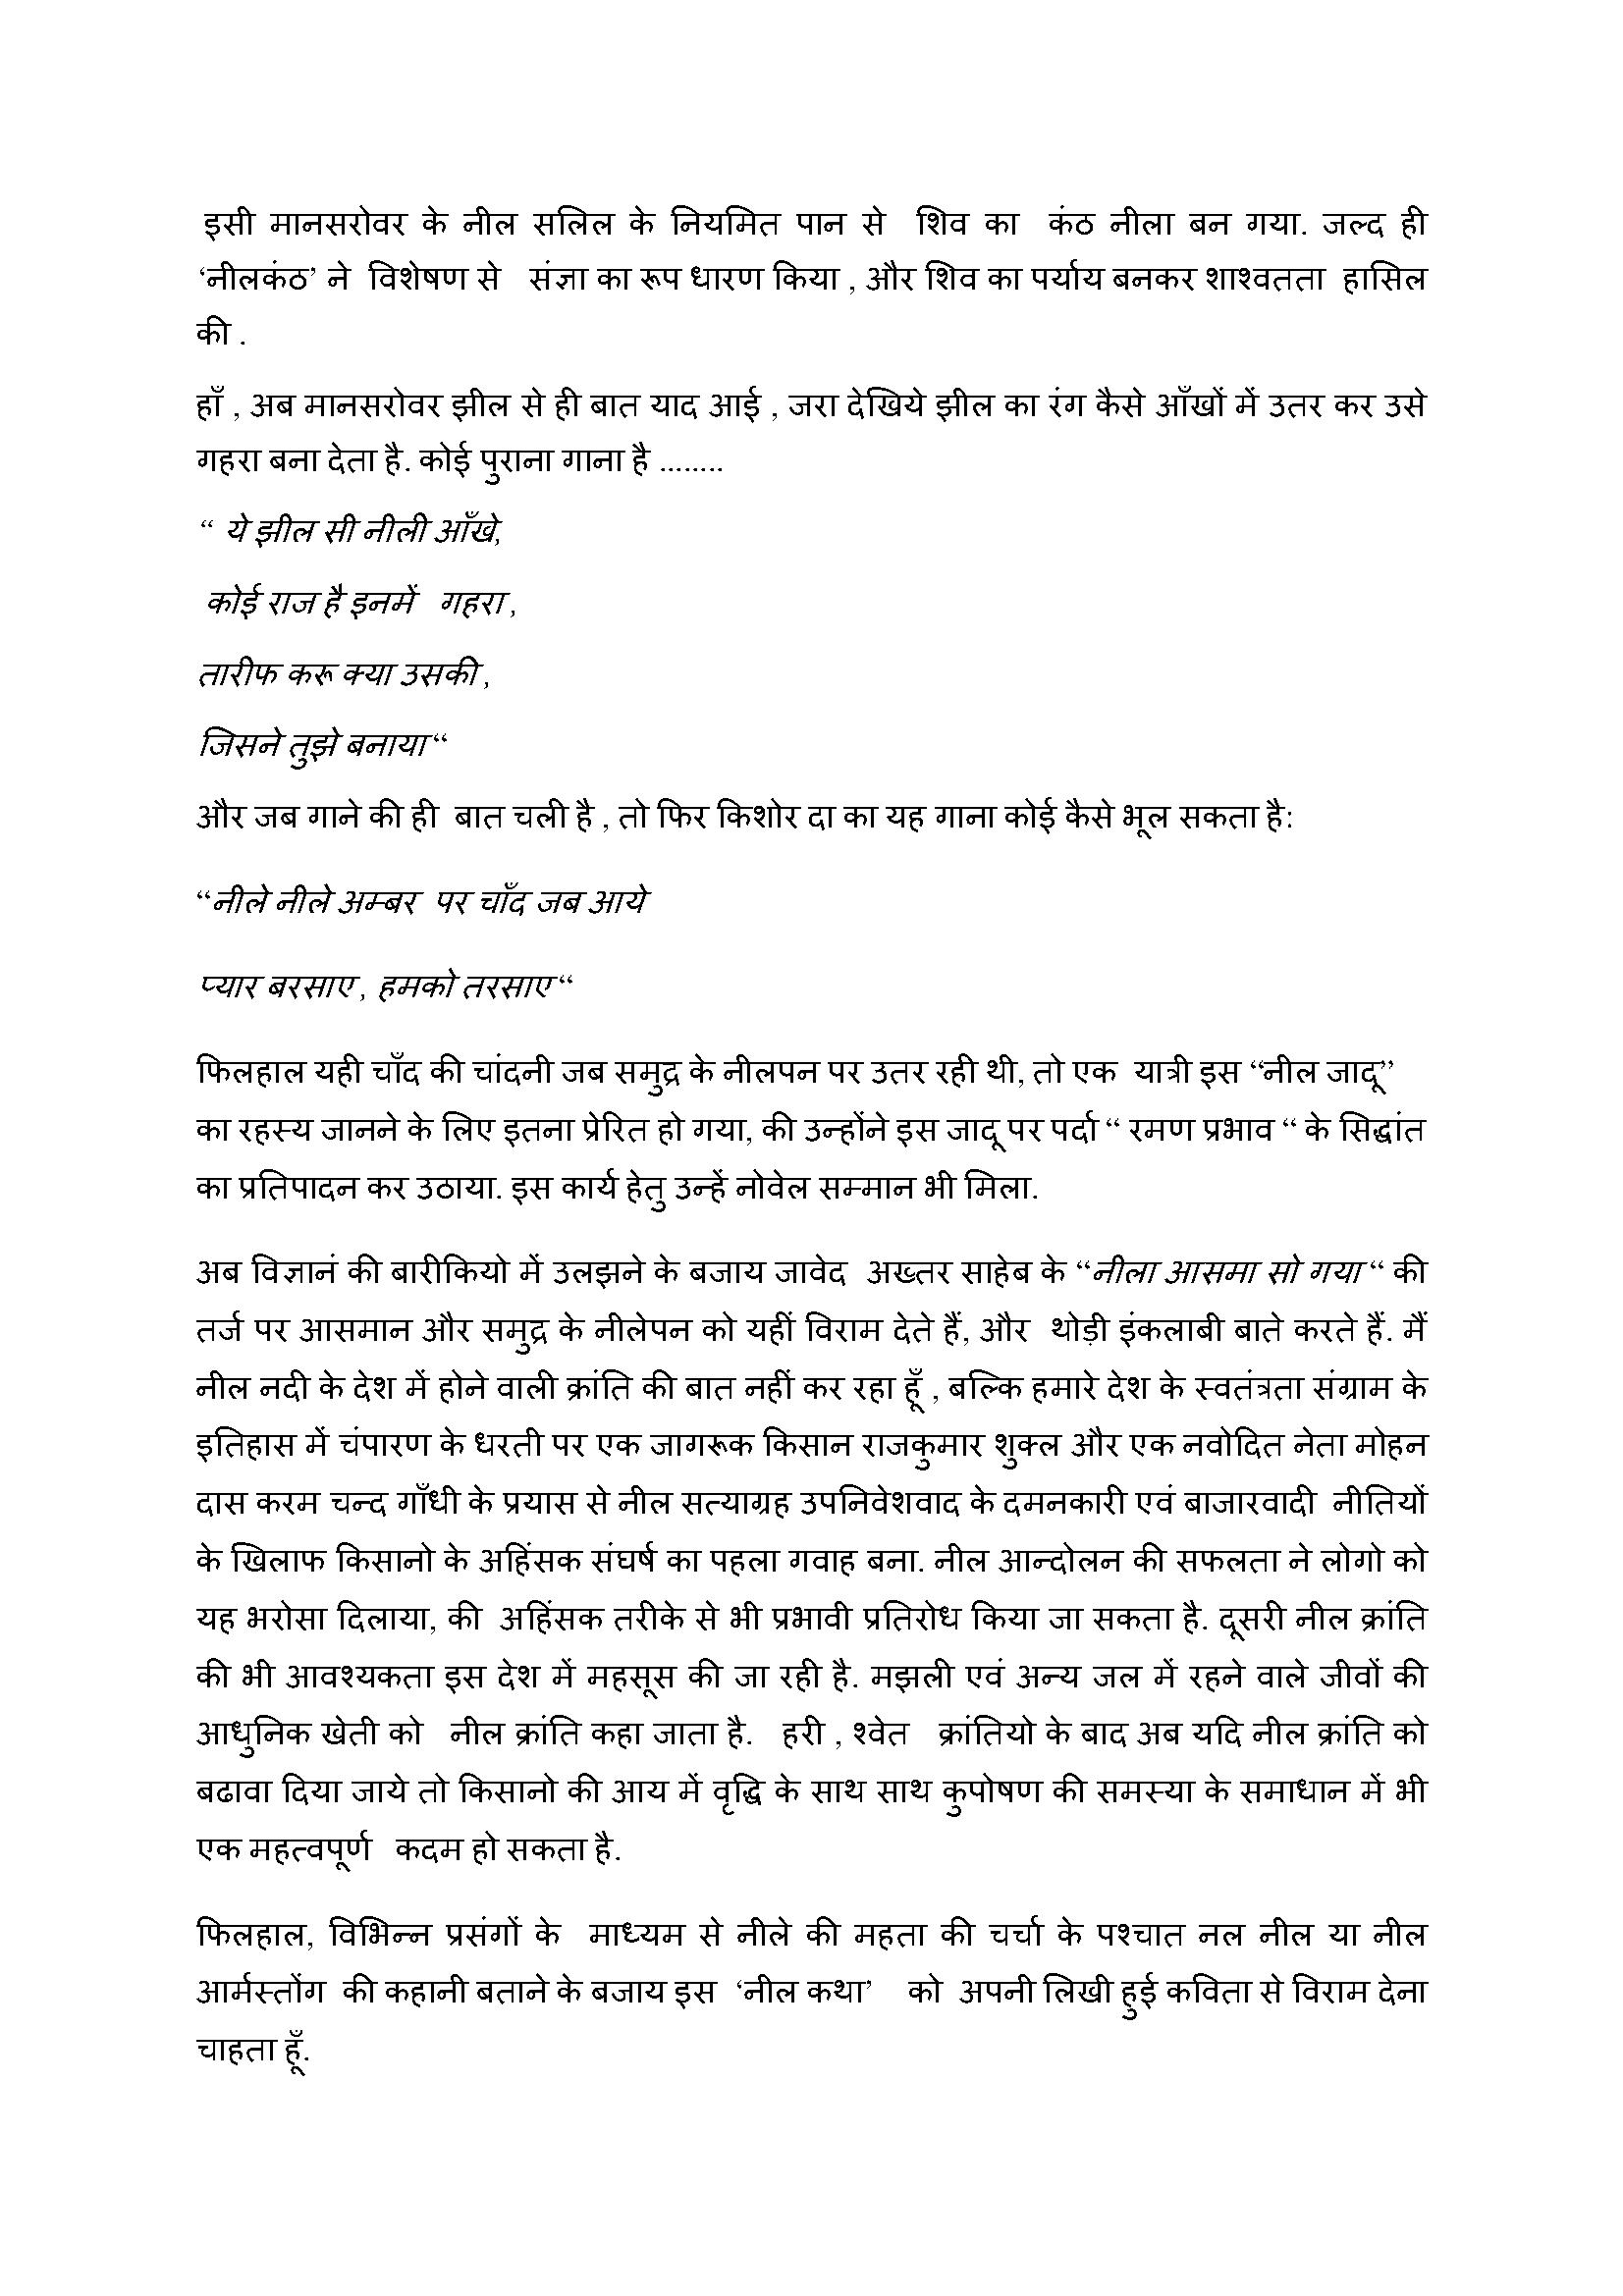 008 Nishant Kumar Iitb Hindi Essay 123104001 Page 2 Study Abroad Essays Amazing Examples Why I Want To Full